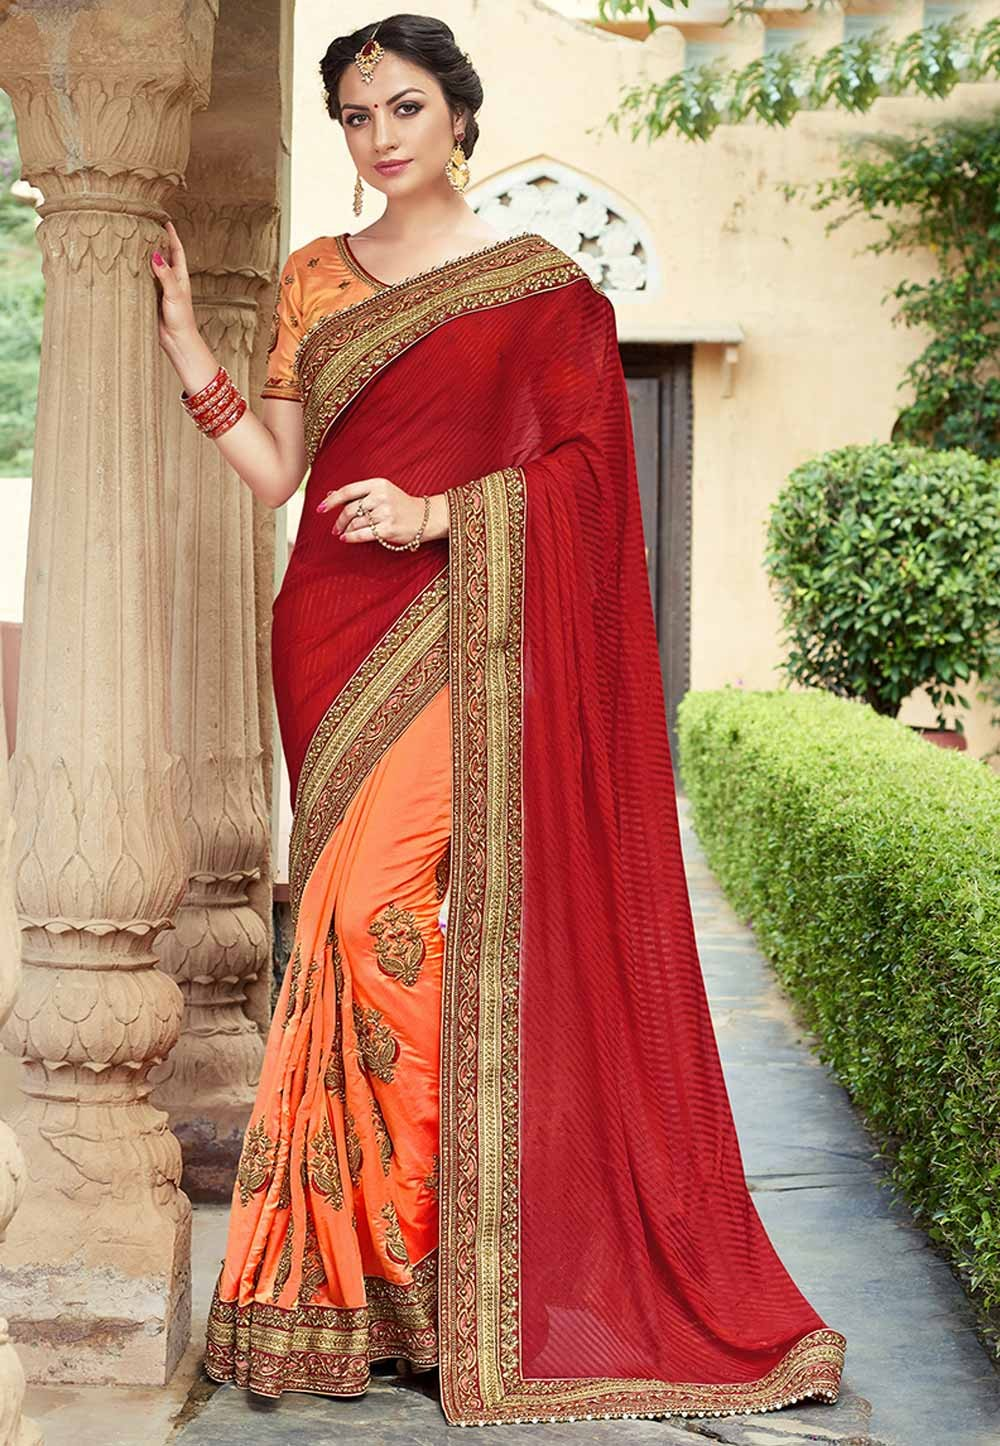 Designer Bridal Saree in Maroon,Orange Color